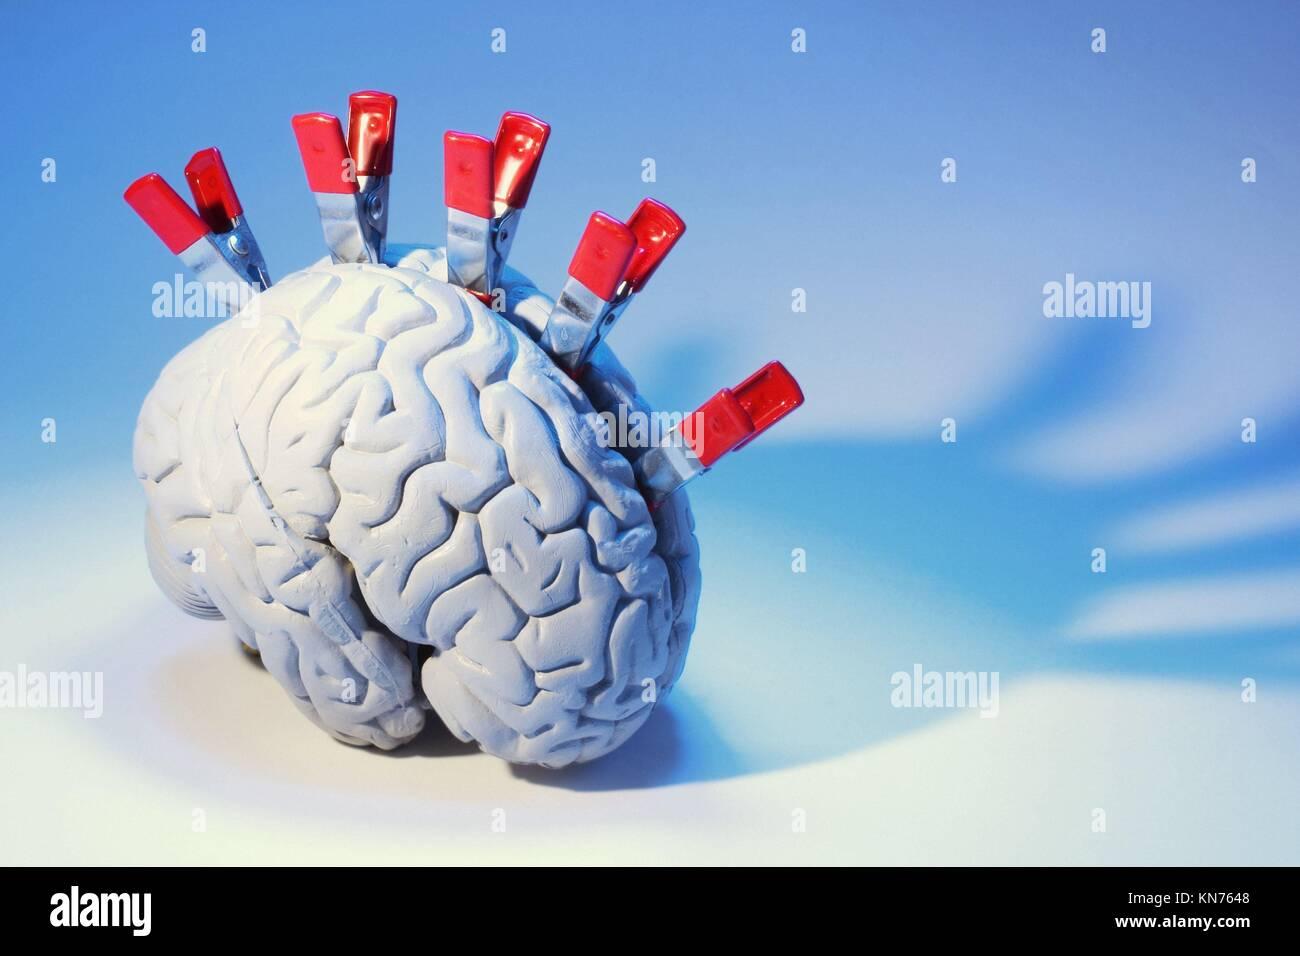 Anatomy Model of Human Brain with Clips Stock Photo: 167959576 - Alamy